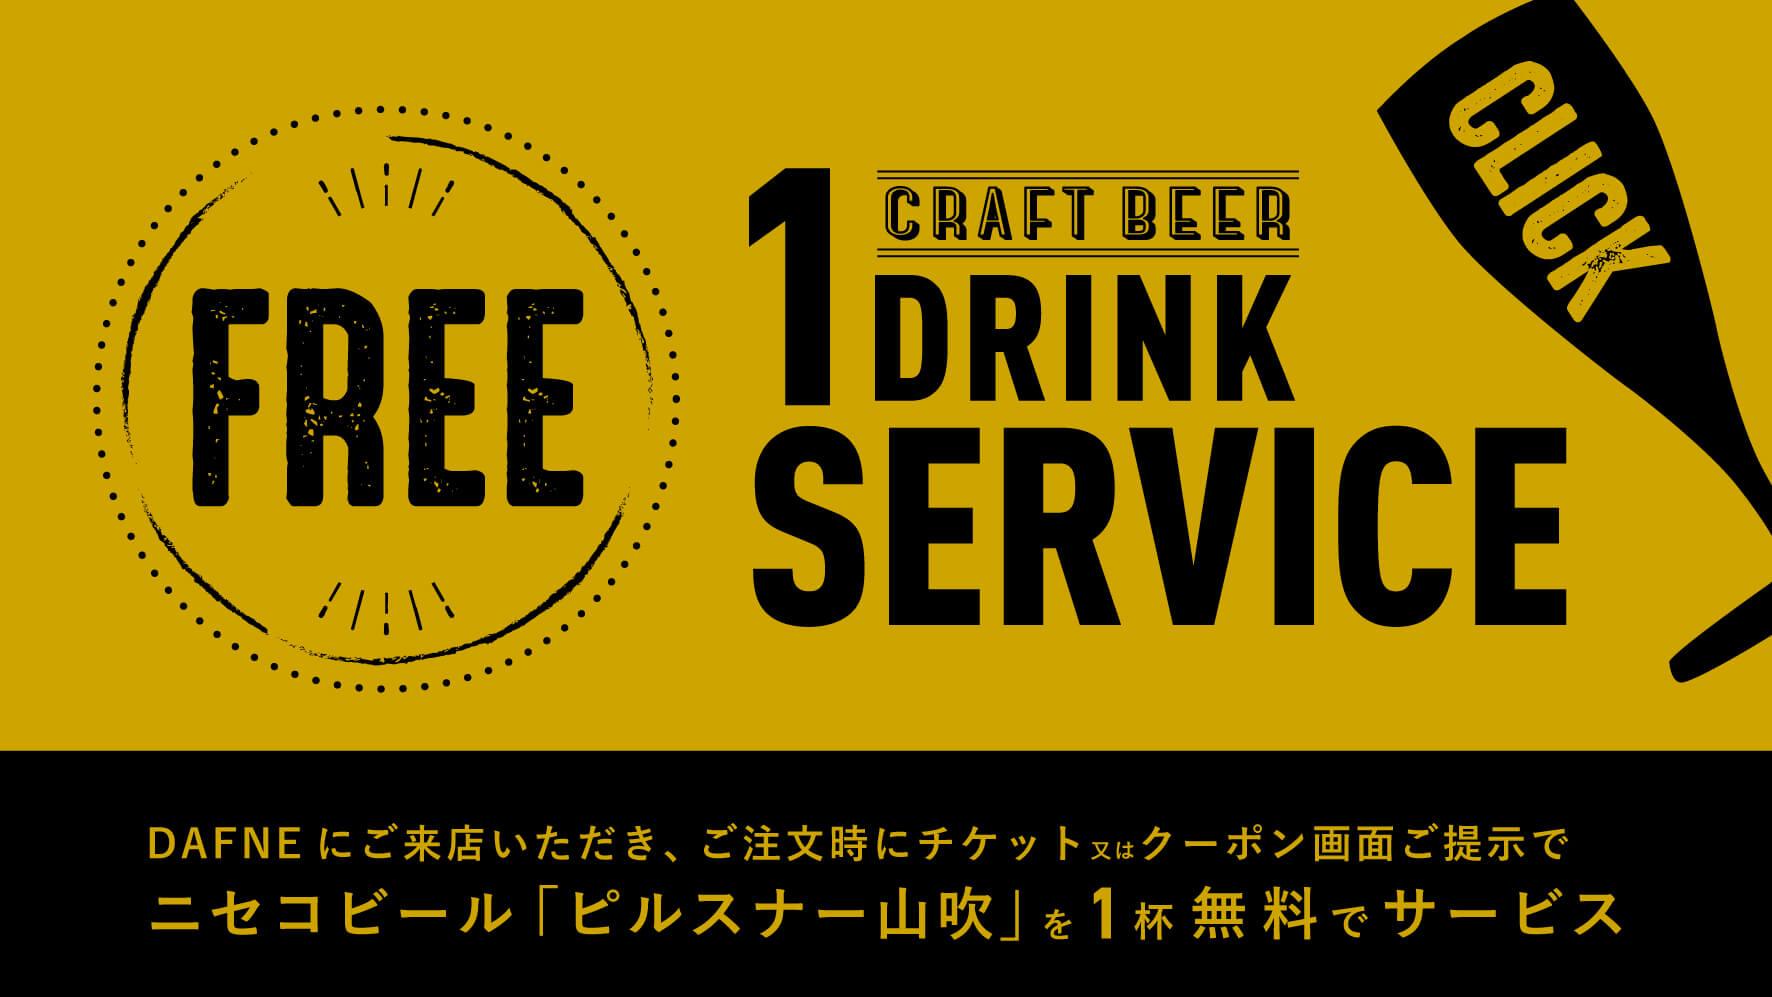 DAFNEクラフトビール1DRINK SERVICE開催中